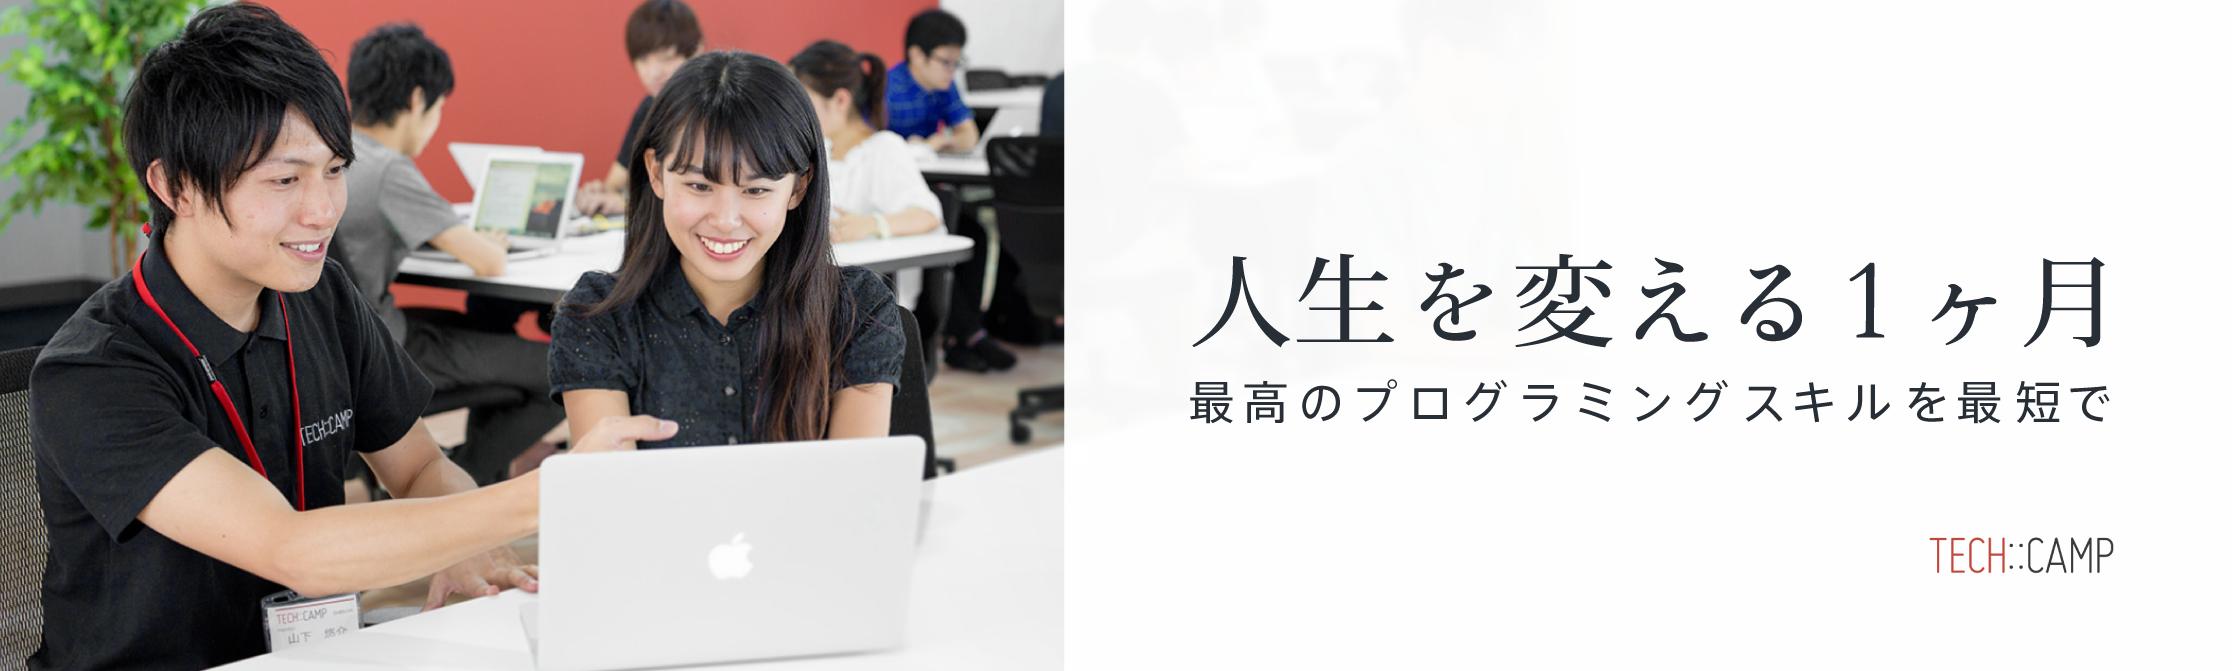 banner_techcamp